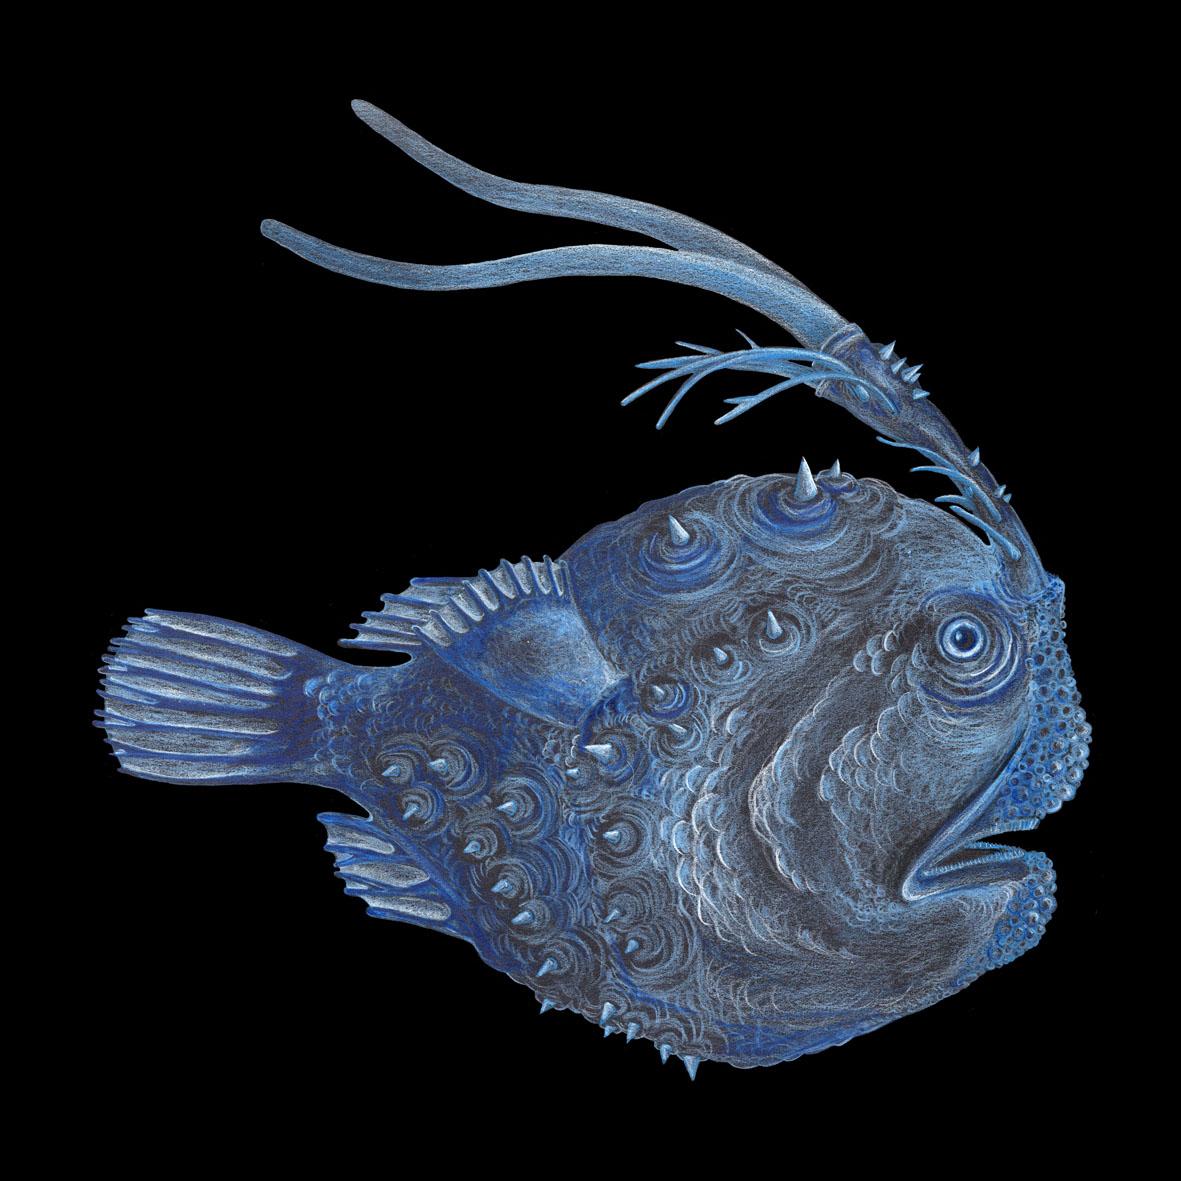 Fußballfisch (Himantolophus compressus)